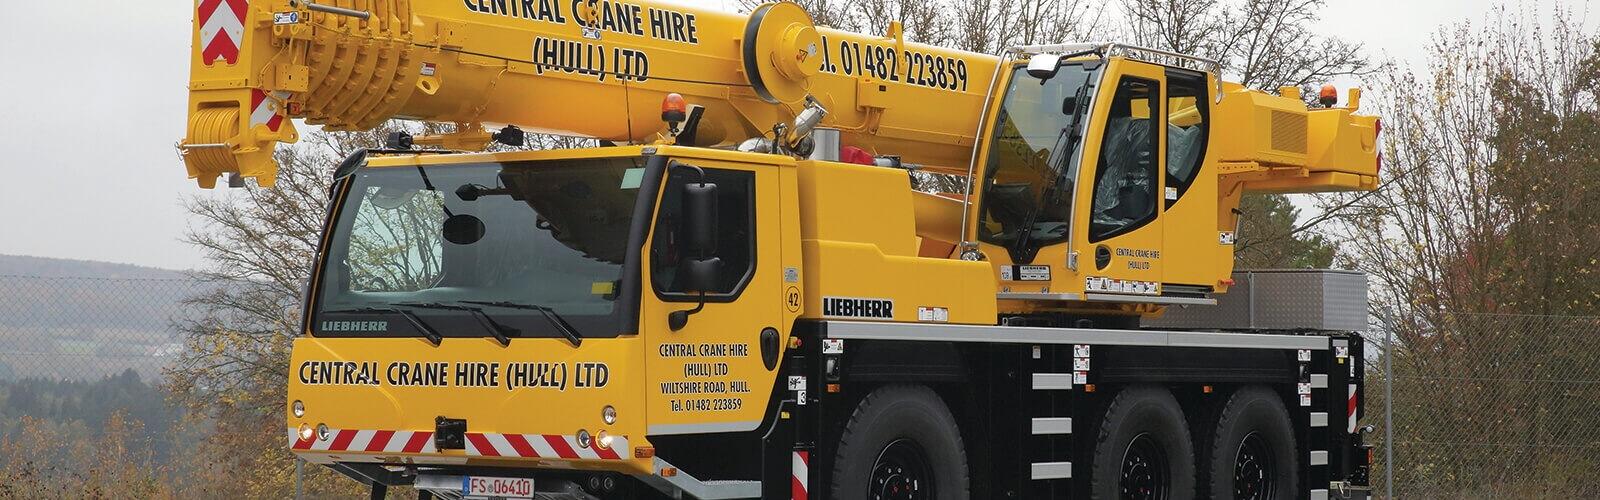 Central Crane Hire Ltd